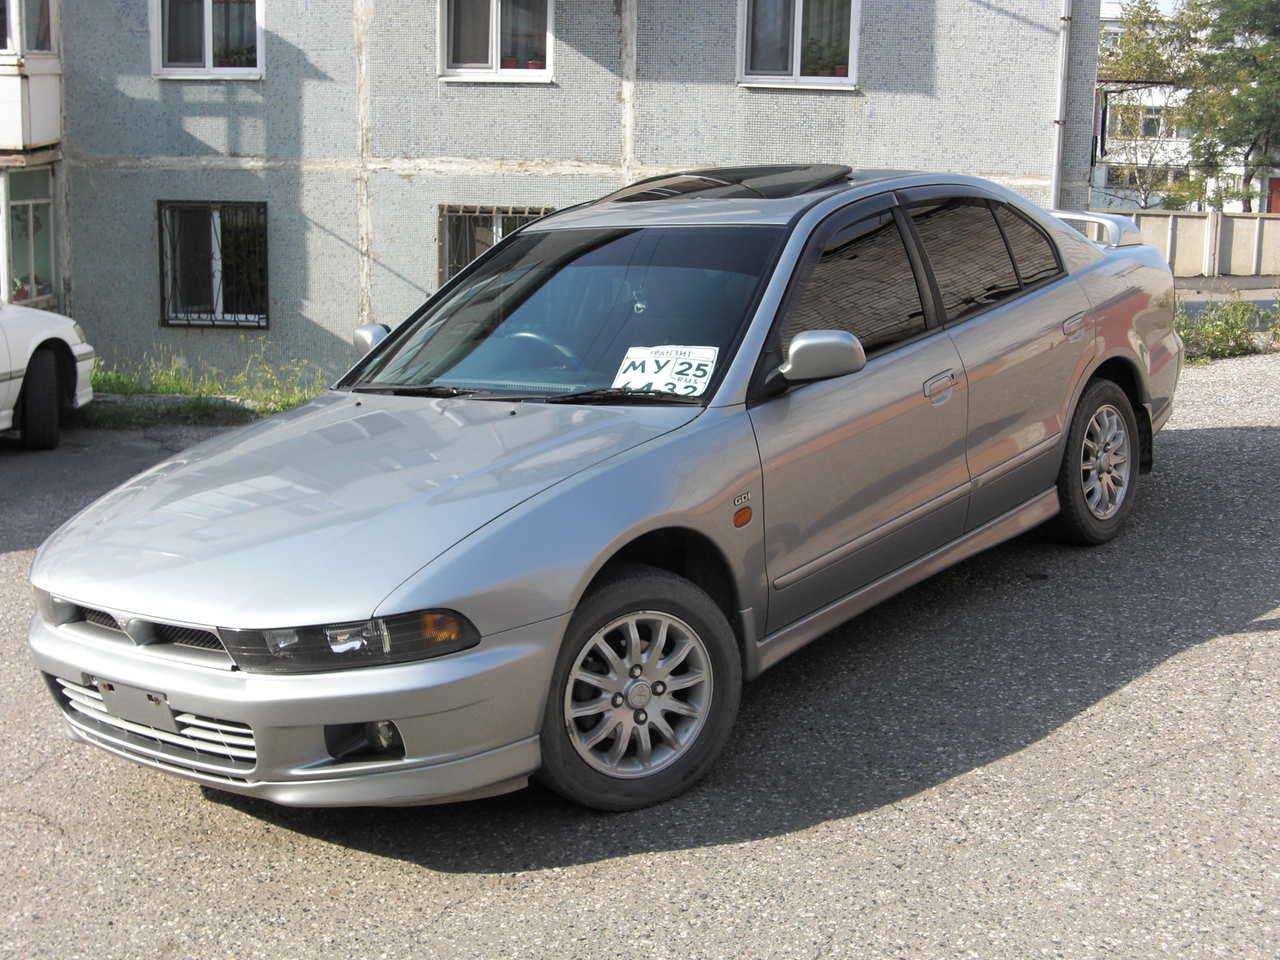 1997 Mitsubishi Galant Pictures, 1.8l., Gasoline, Automatic For Sale